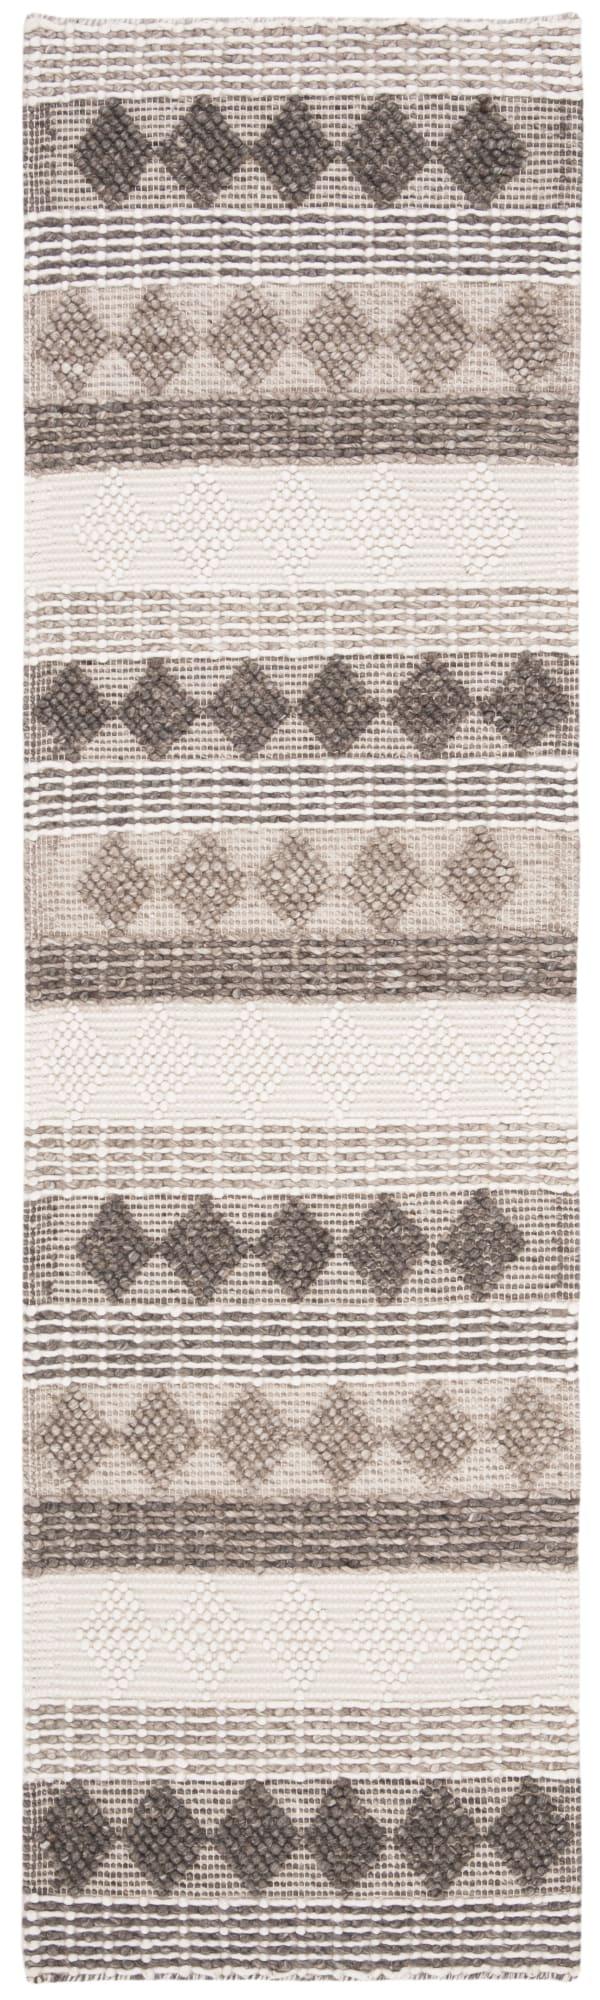 Safavieh Gray Wool Rug